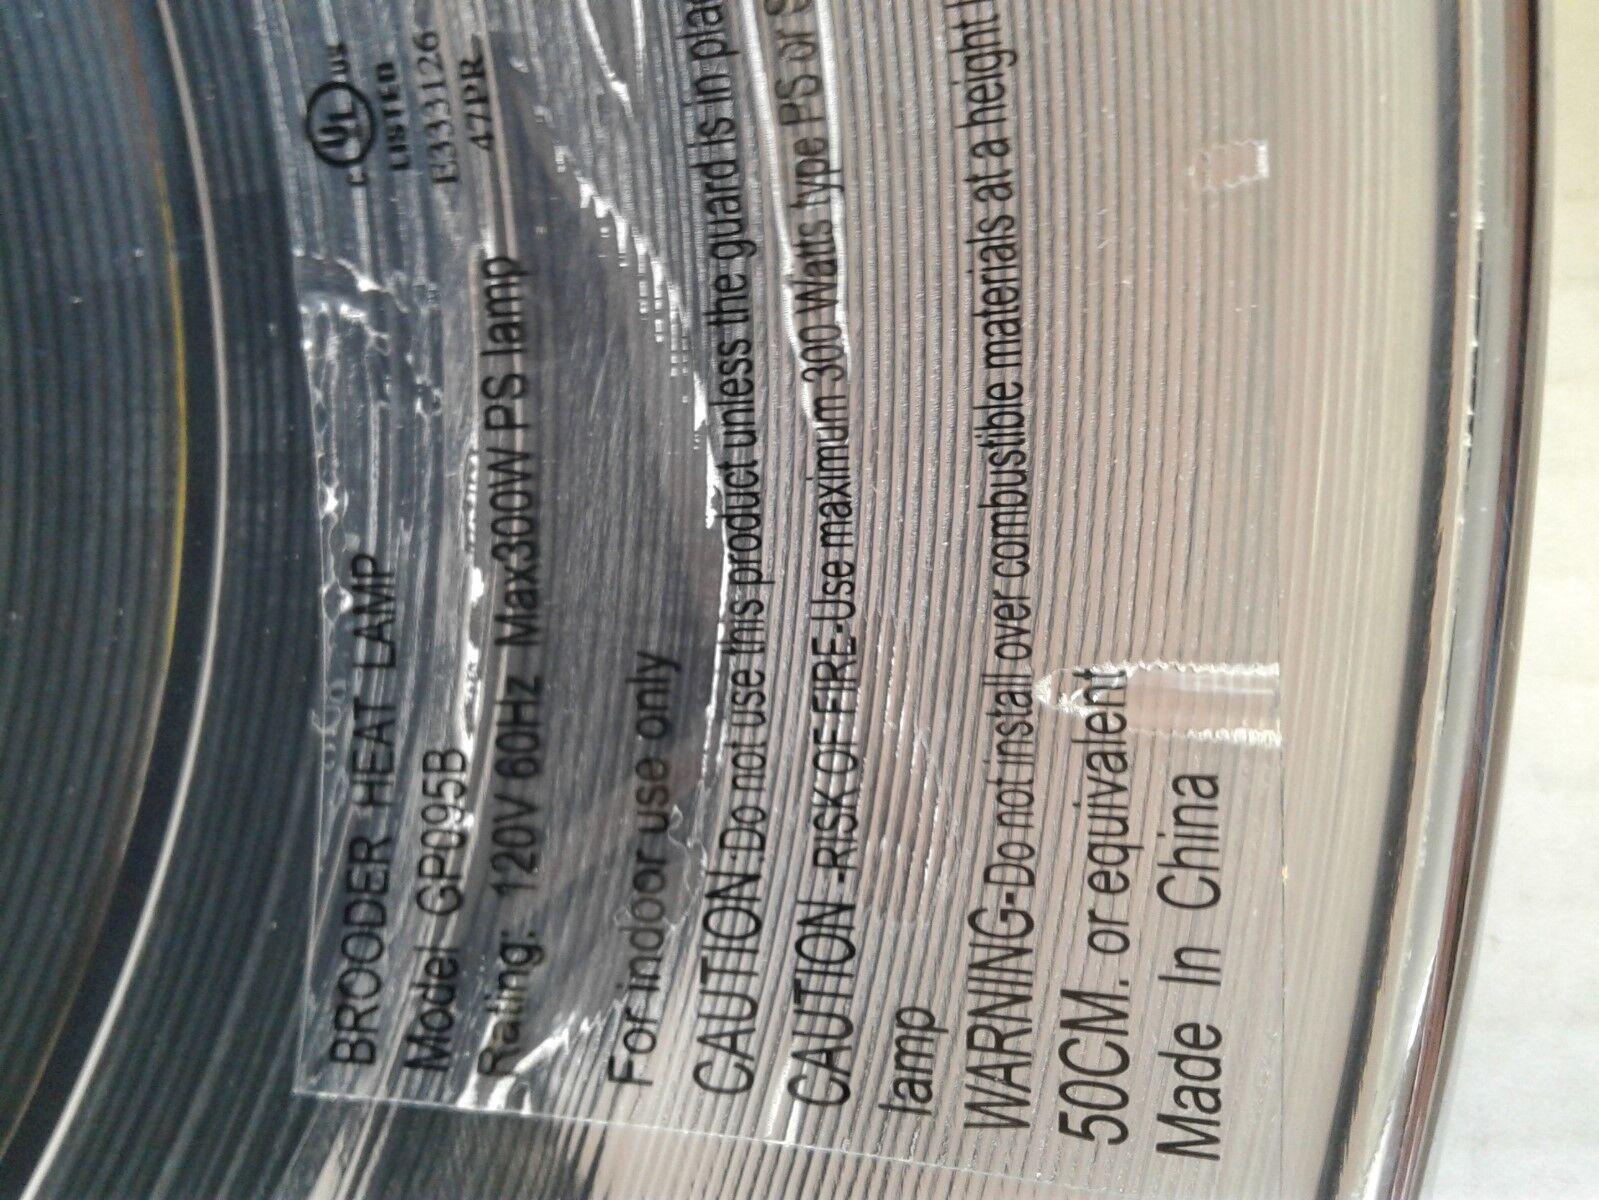 Brooder Heat Lamp 300 watts 9/' cord Reflector Sheild /& Guard CD Pro Power Cords